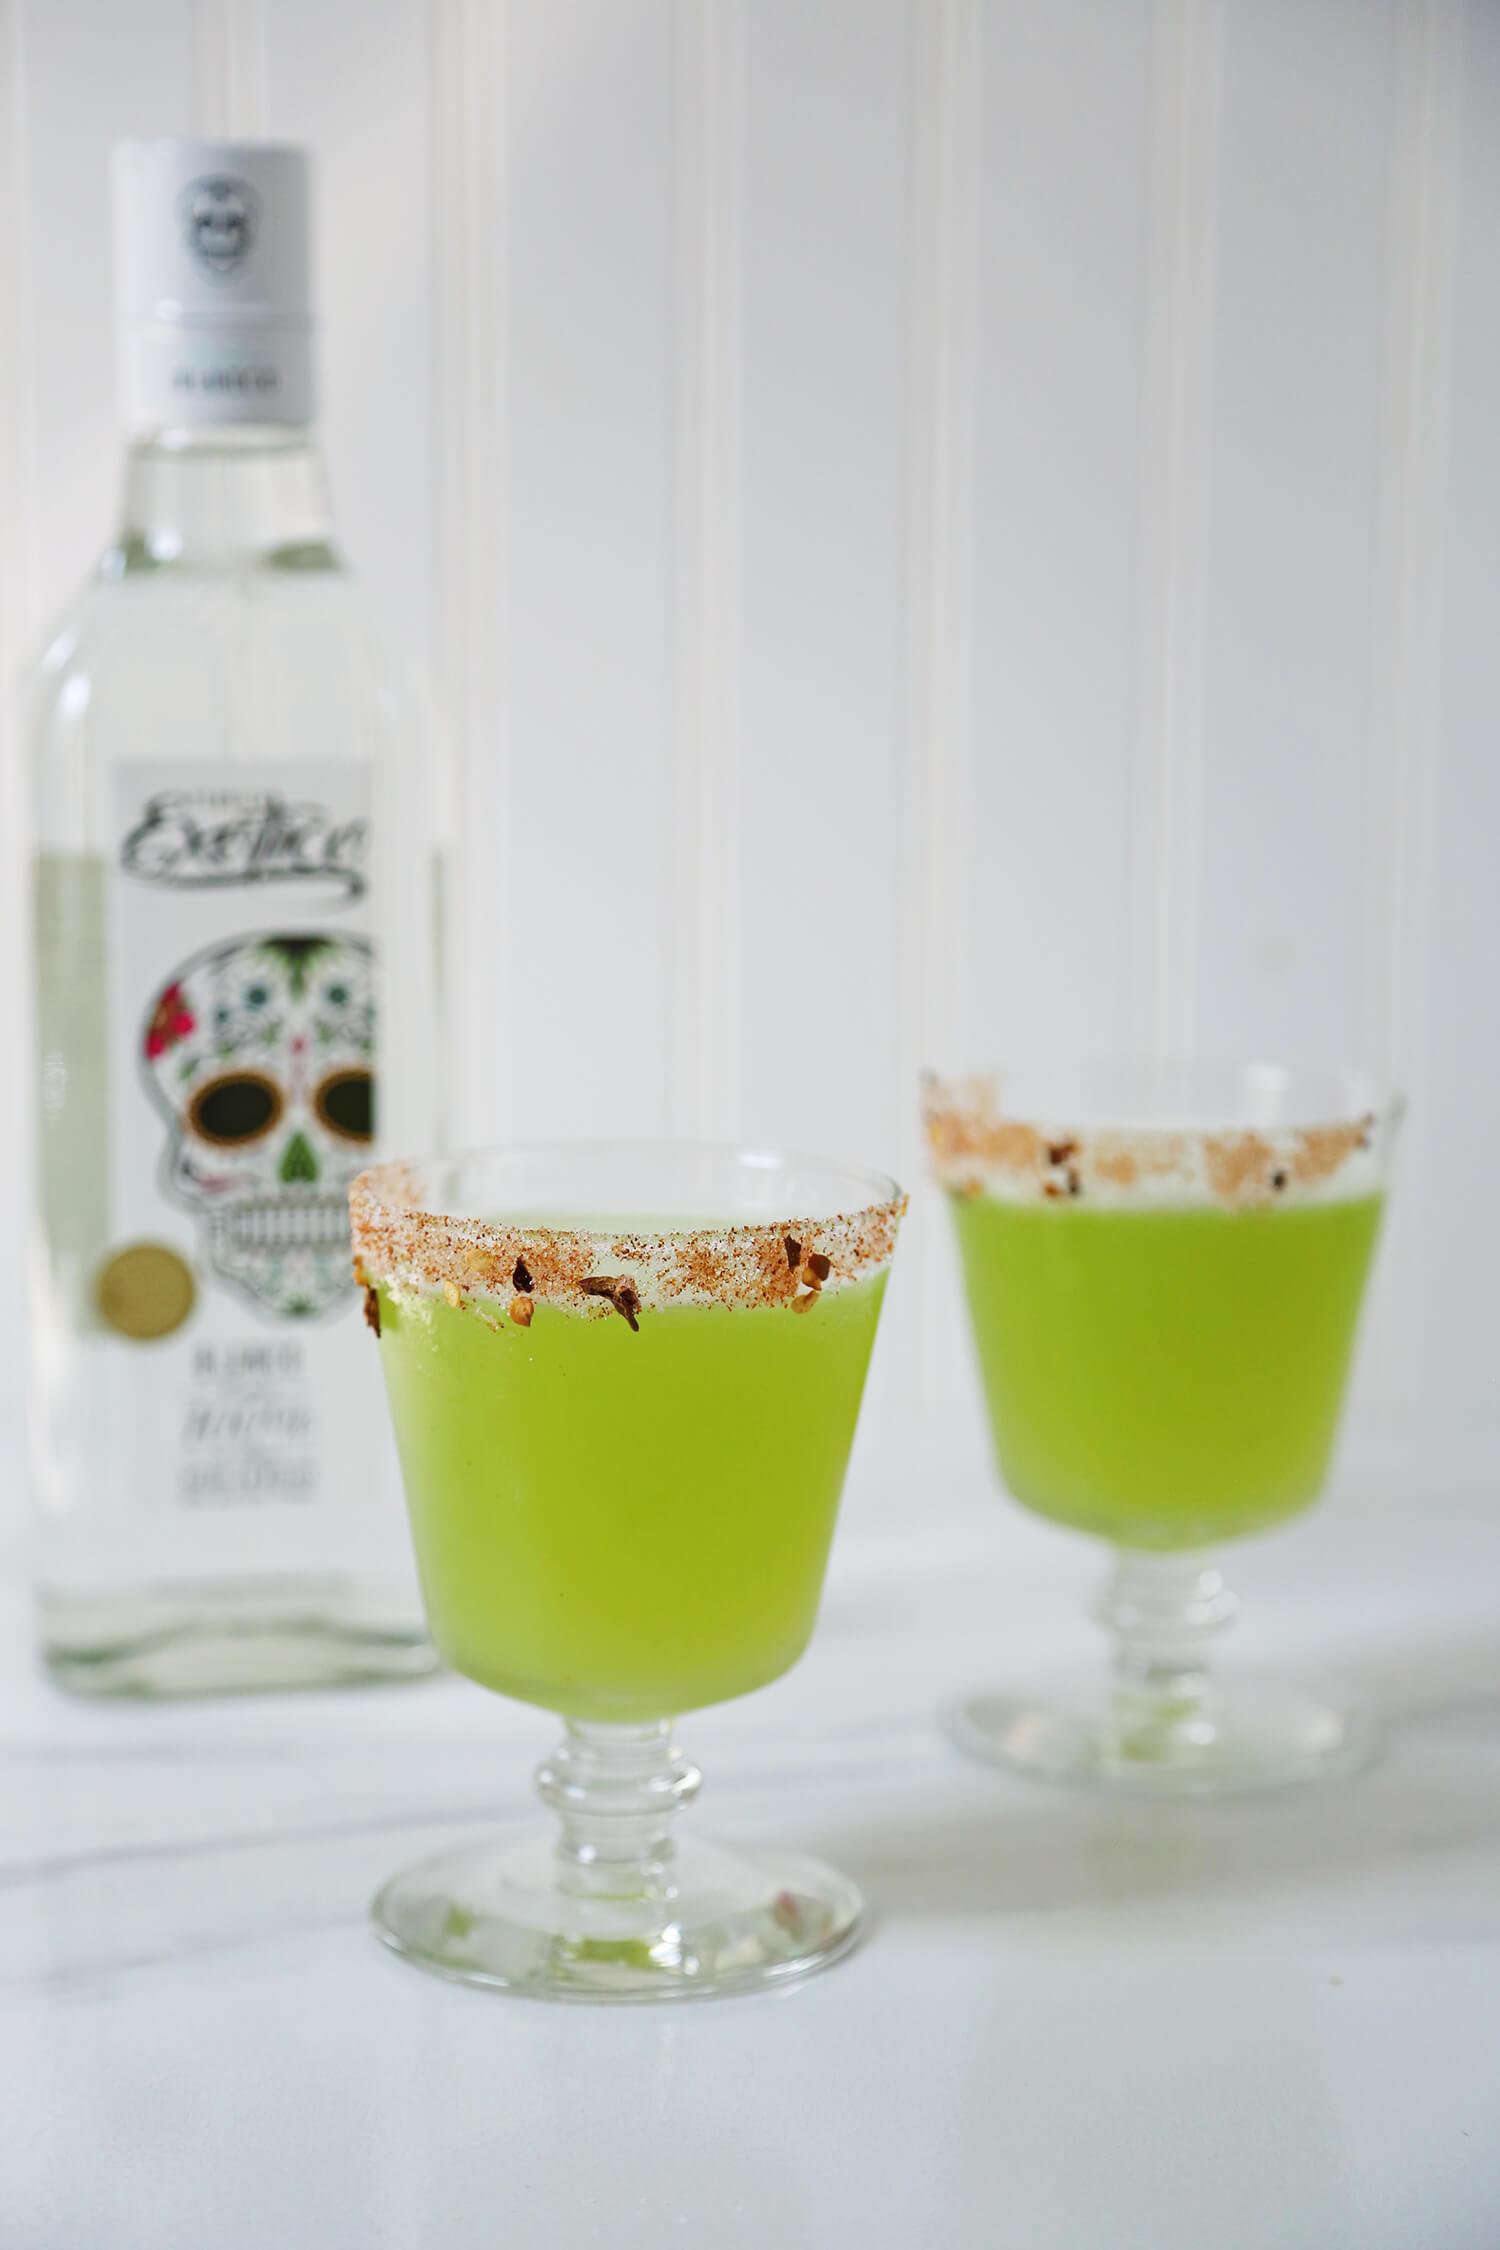 The Green Garden Cocktail